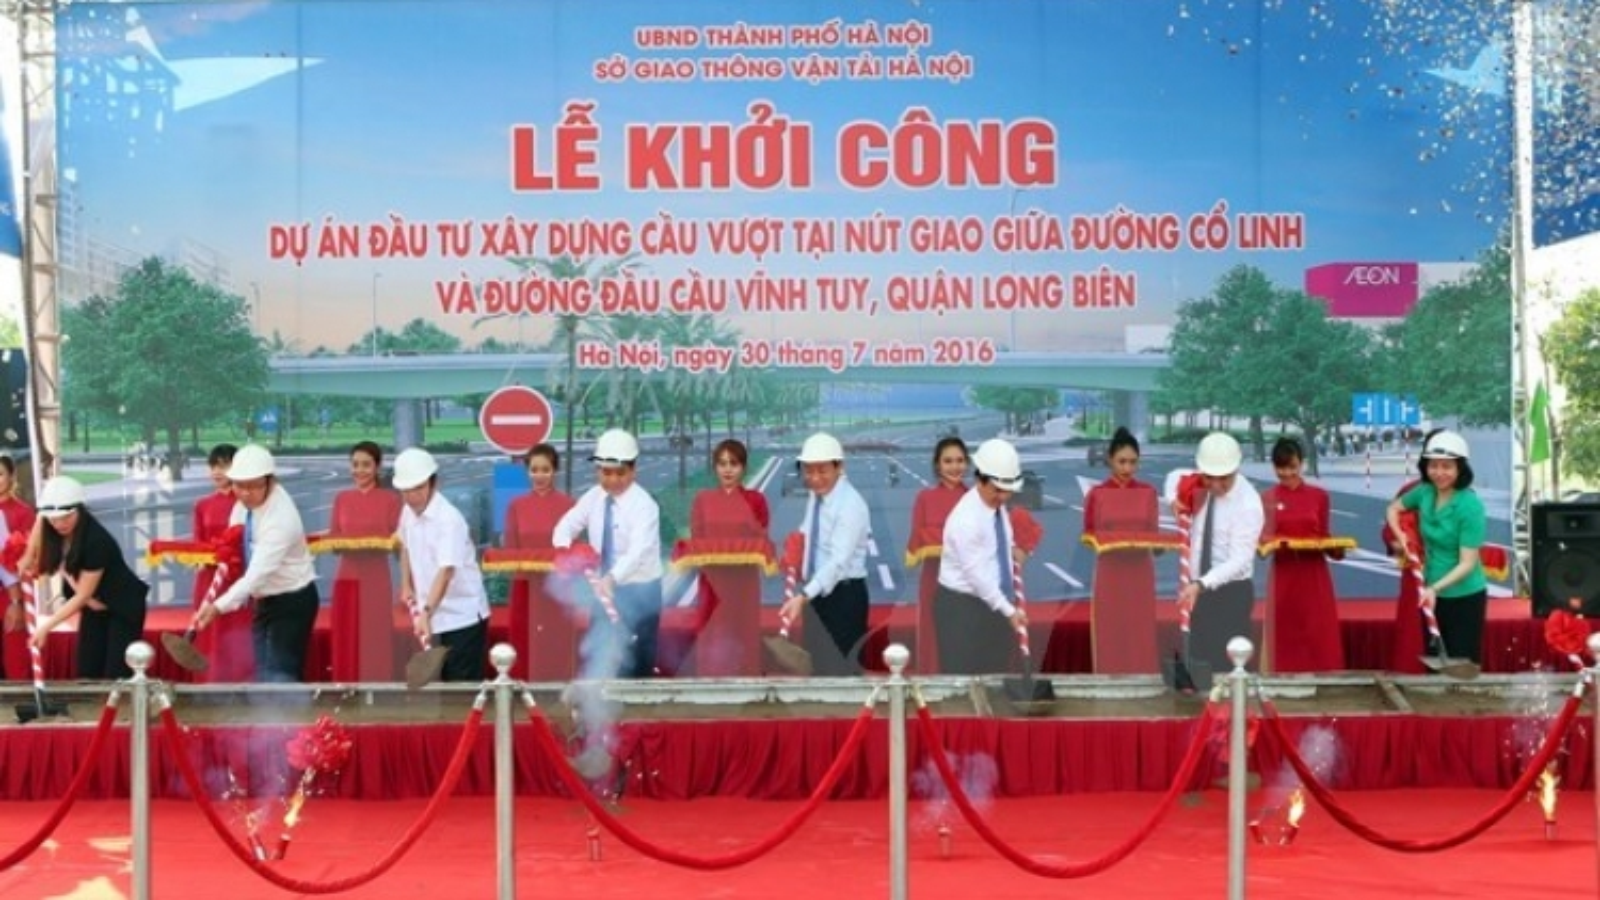 Construction begins on new overpass in Hanoi